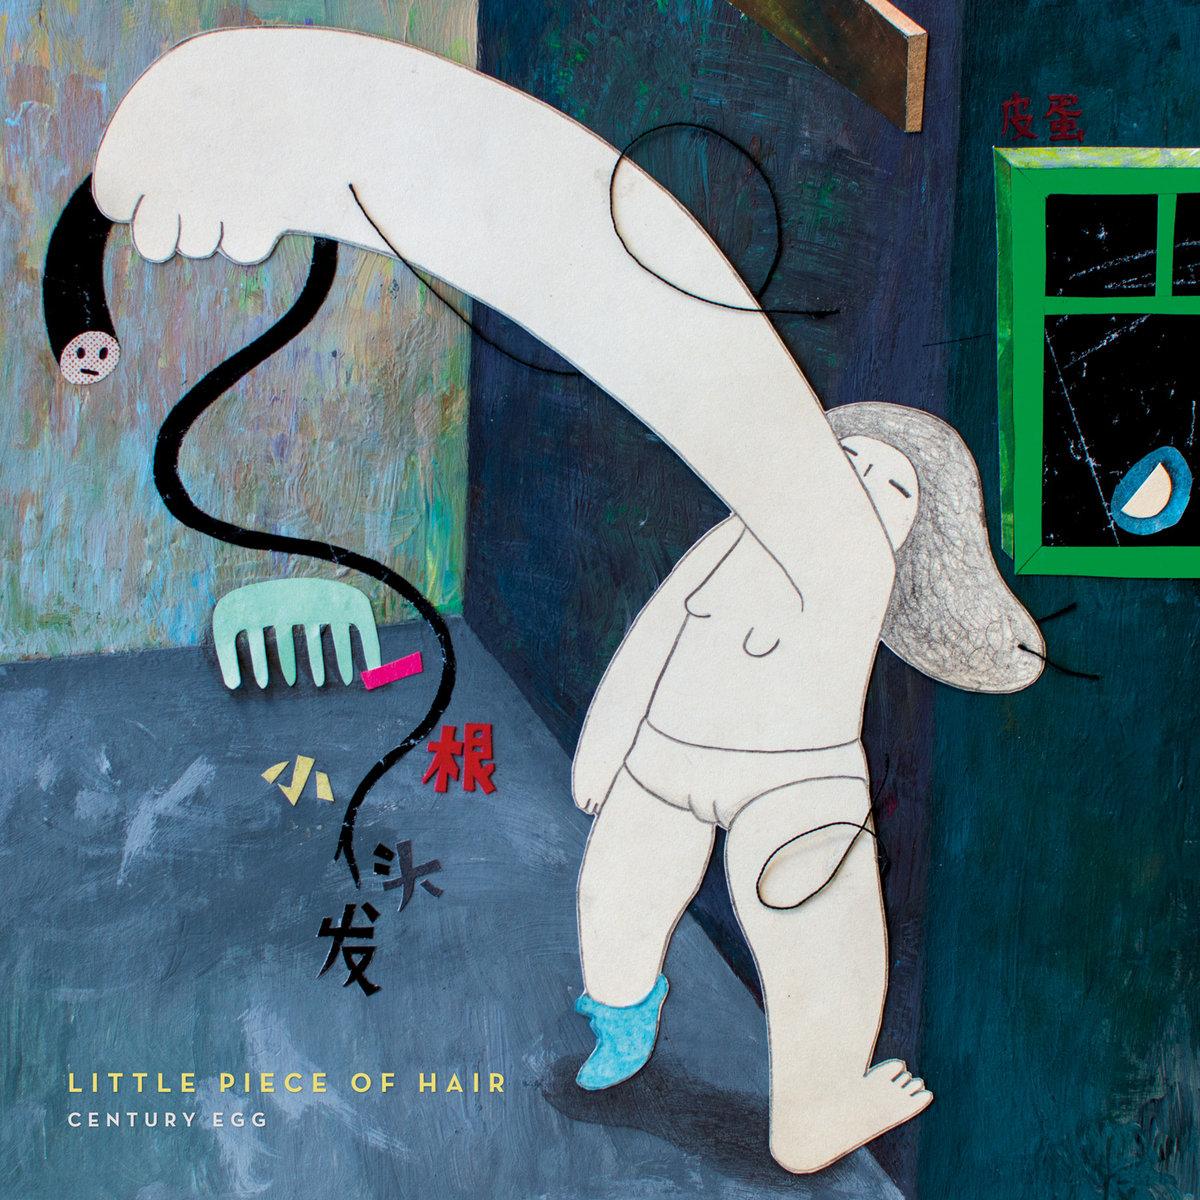 Century Egg   Little Piece of Hair EP   Forward Music Group